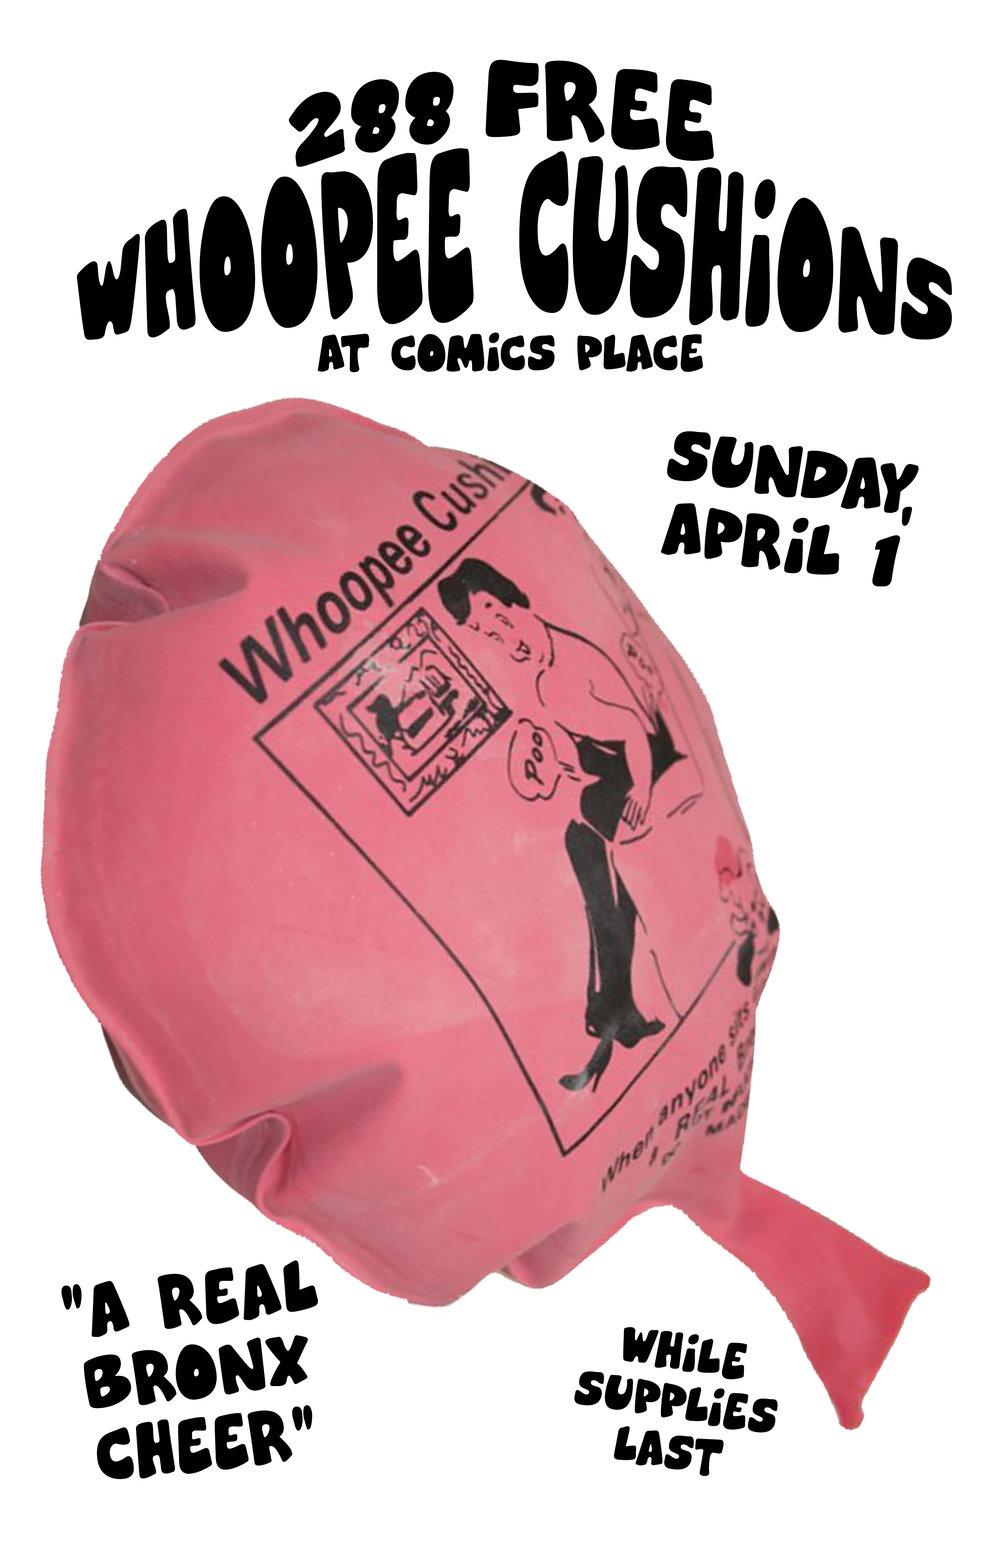 whoopee-cushions-poster-2018.jpg